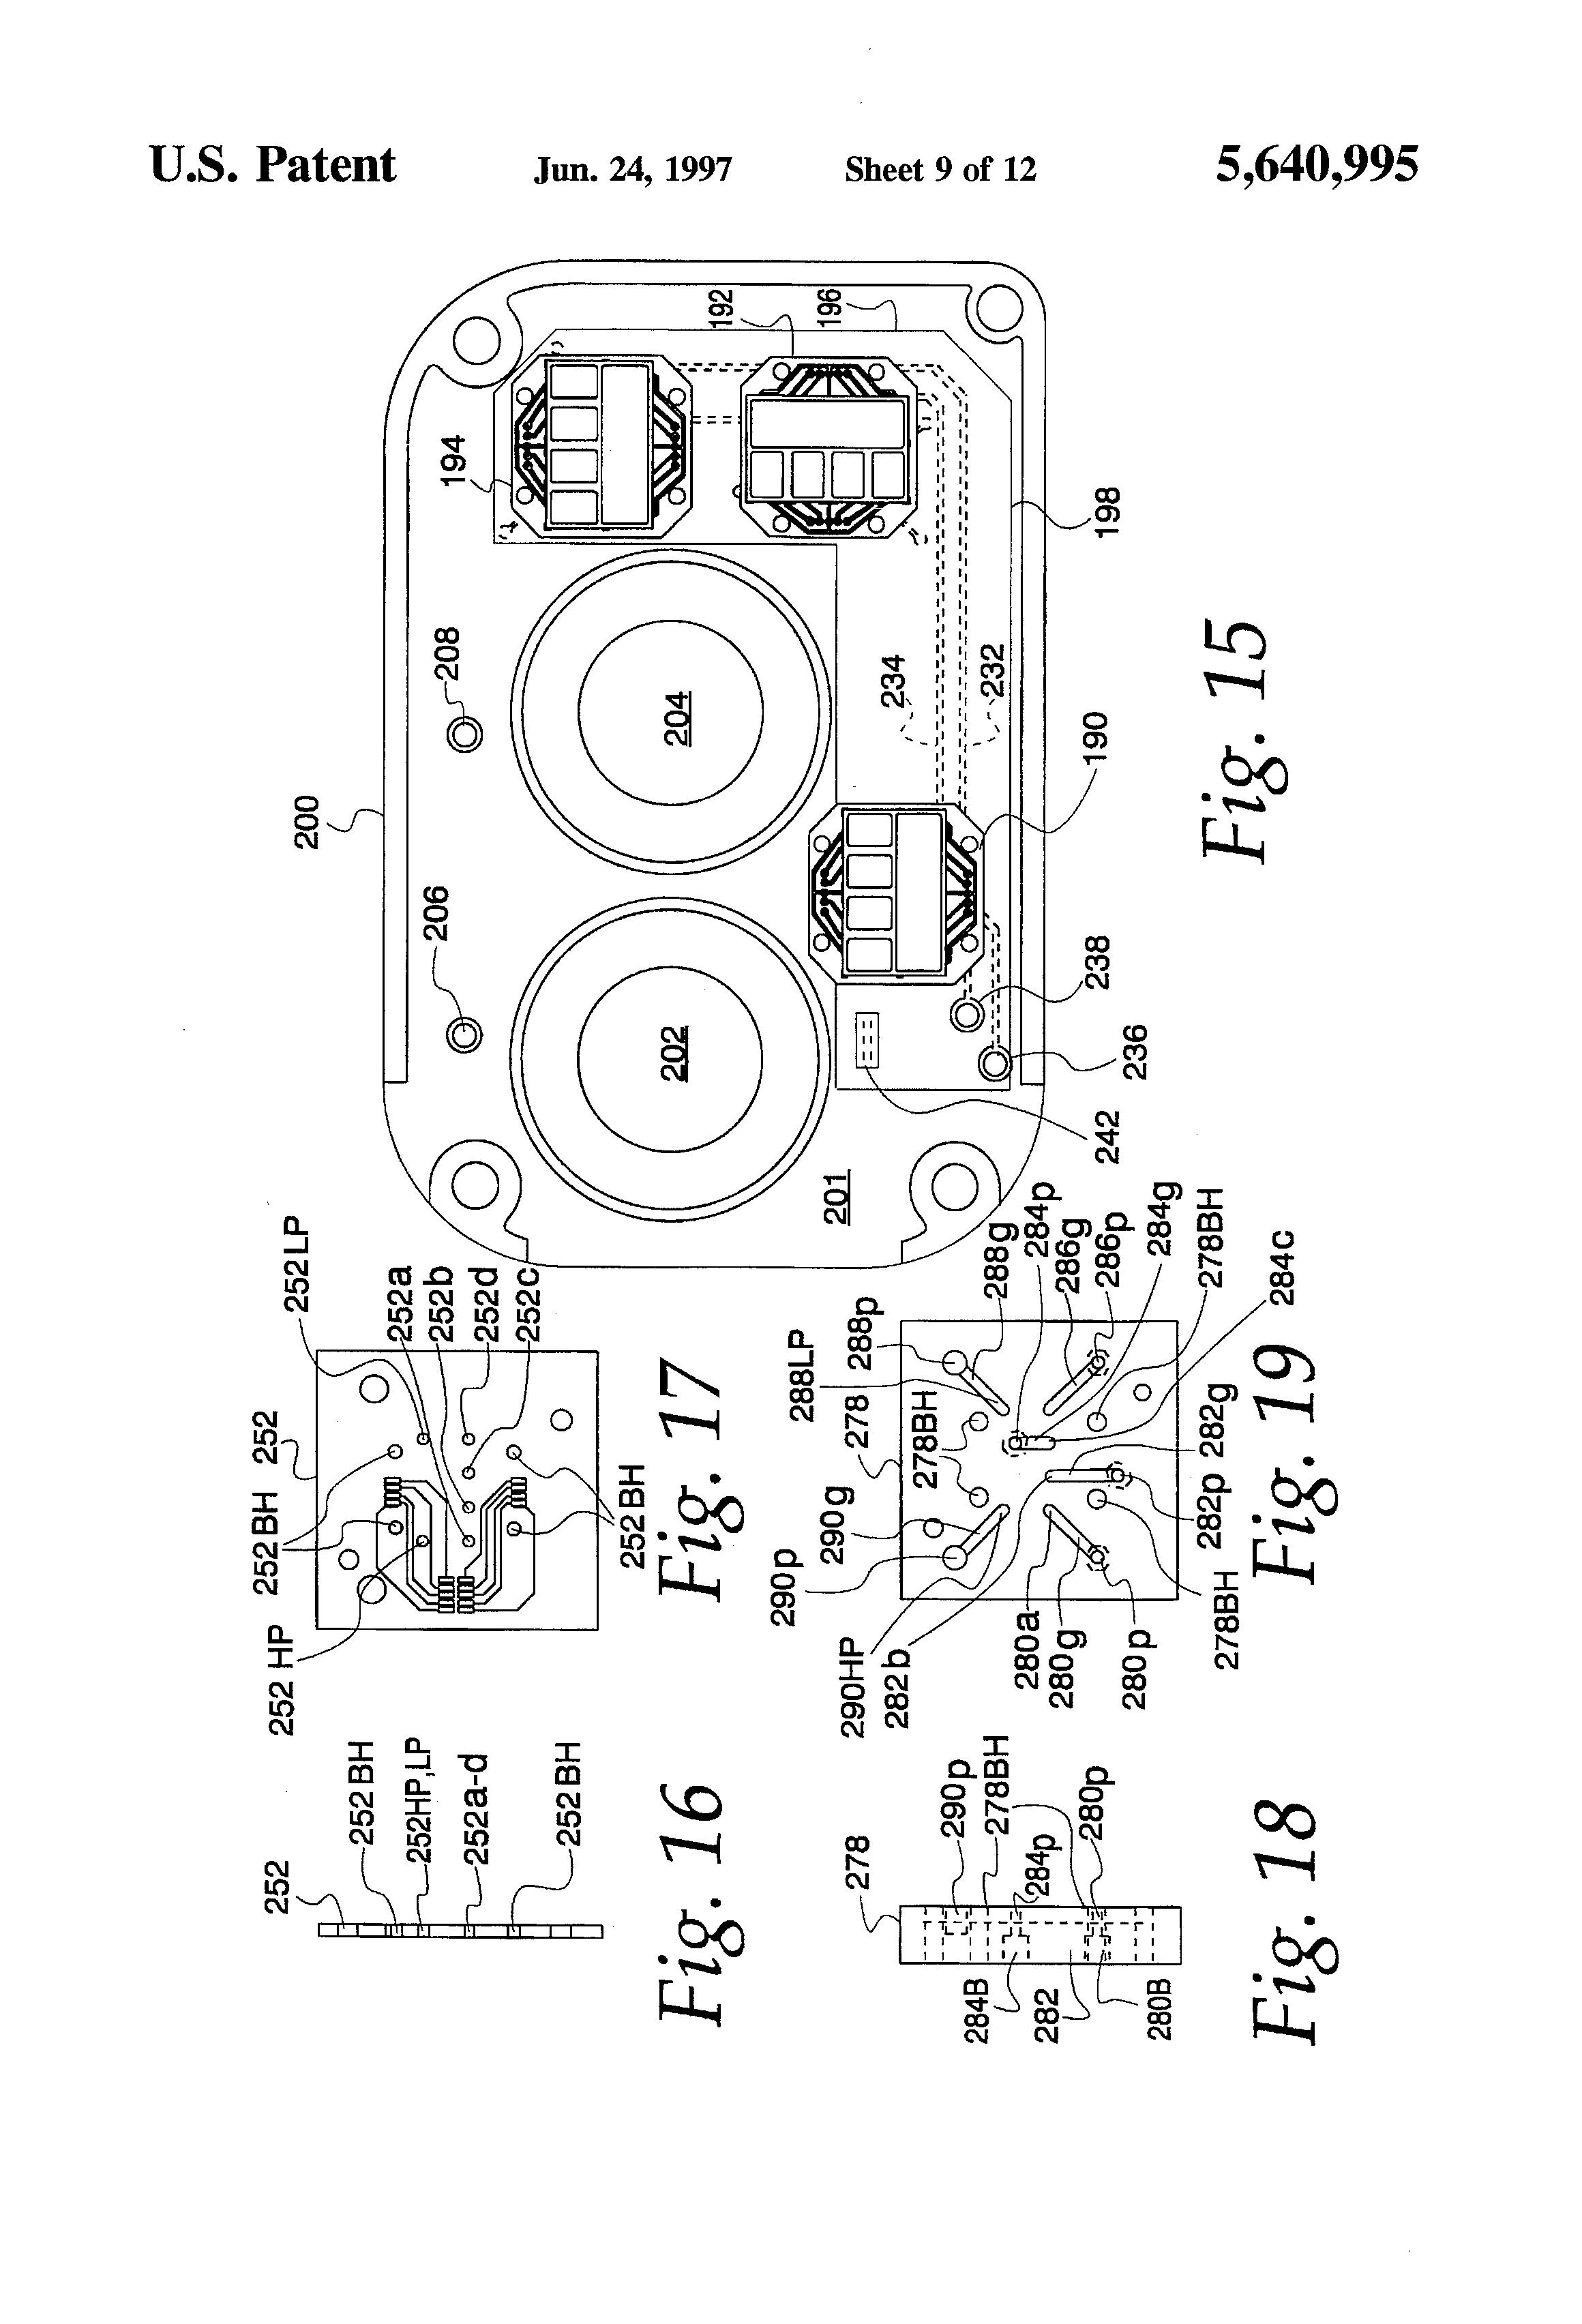 u041f u0430 u0442 u0435 u043d u0442 us5640995 - electrofluidic standard module and custom circuit board assembly